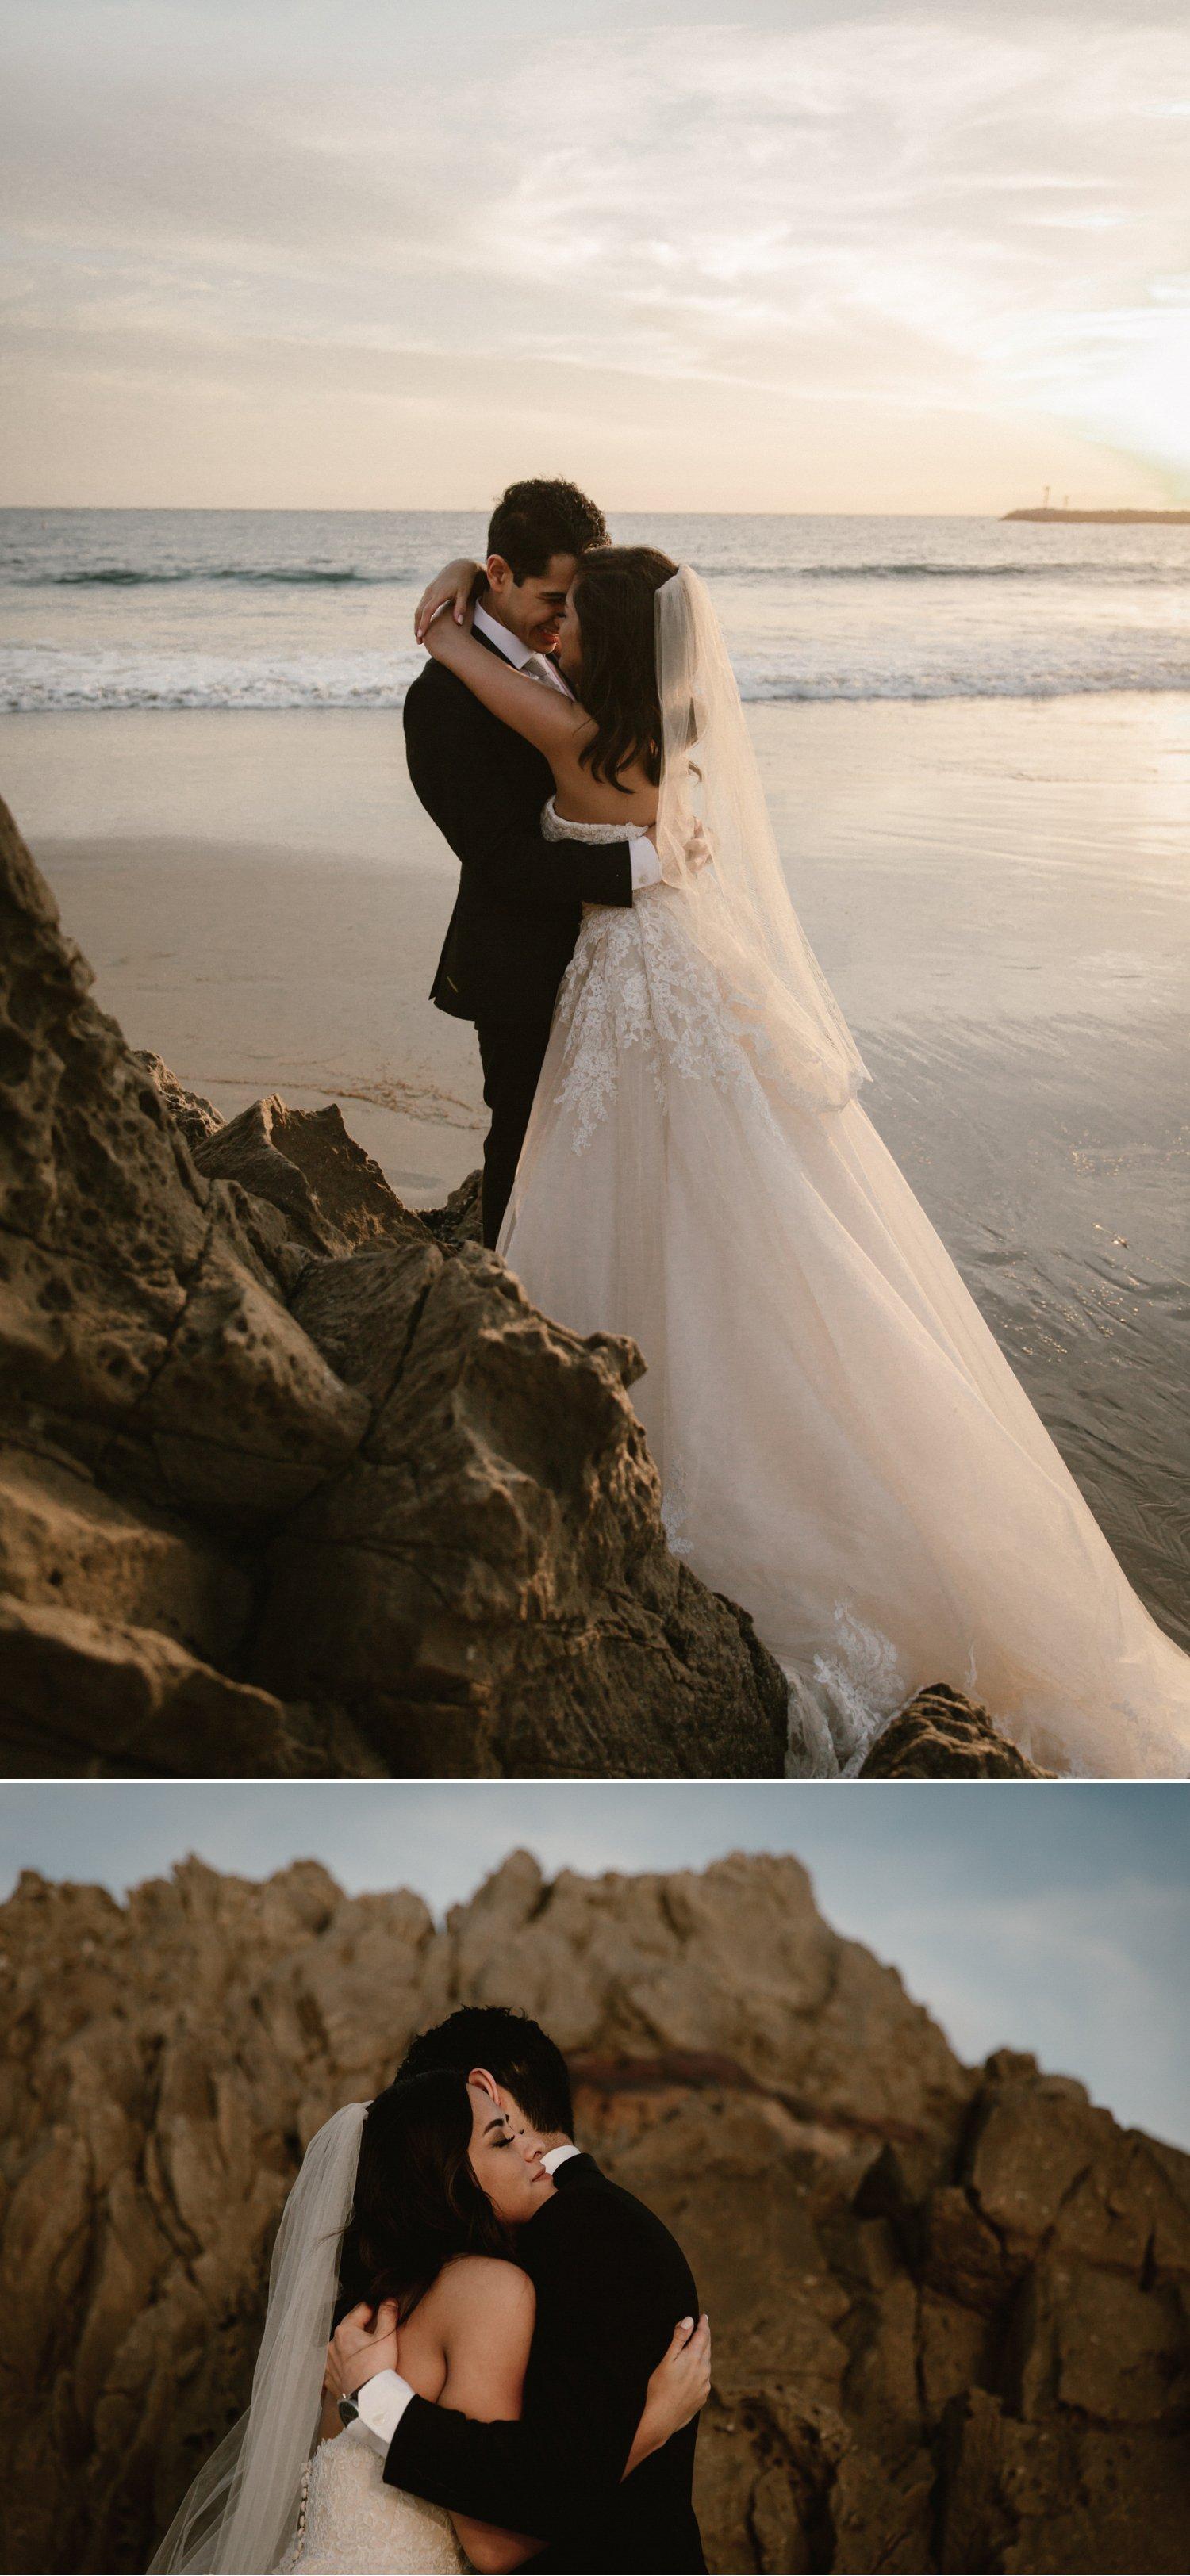 Corona del Mar Wedding Orange County